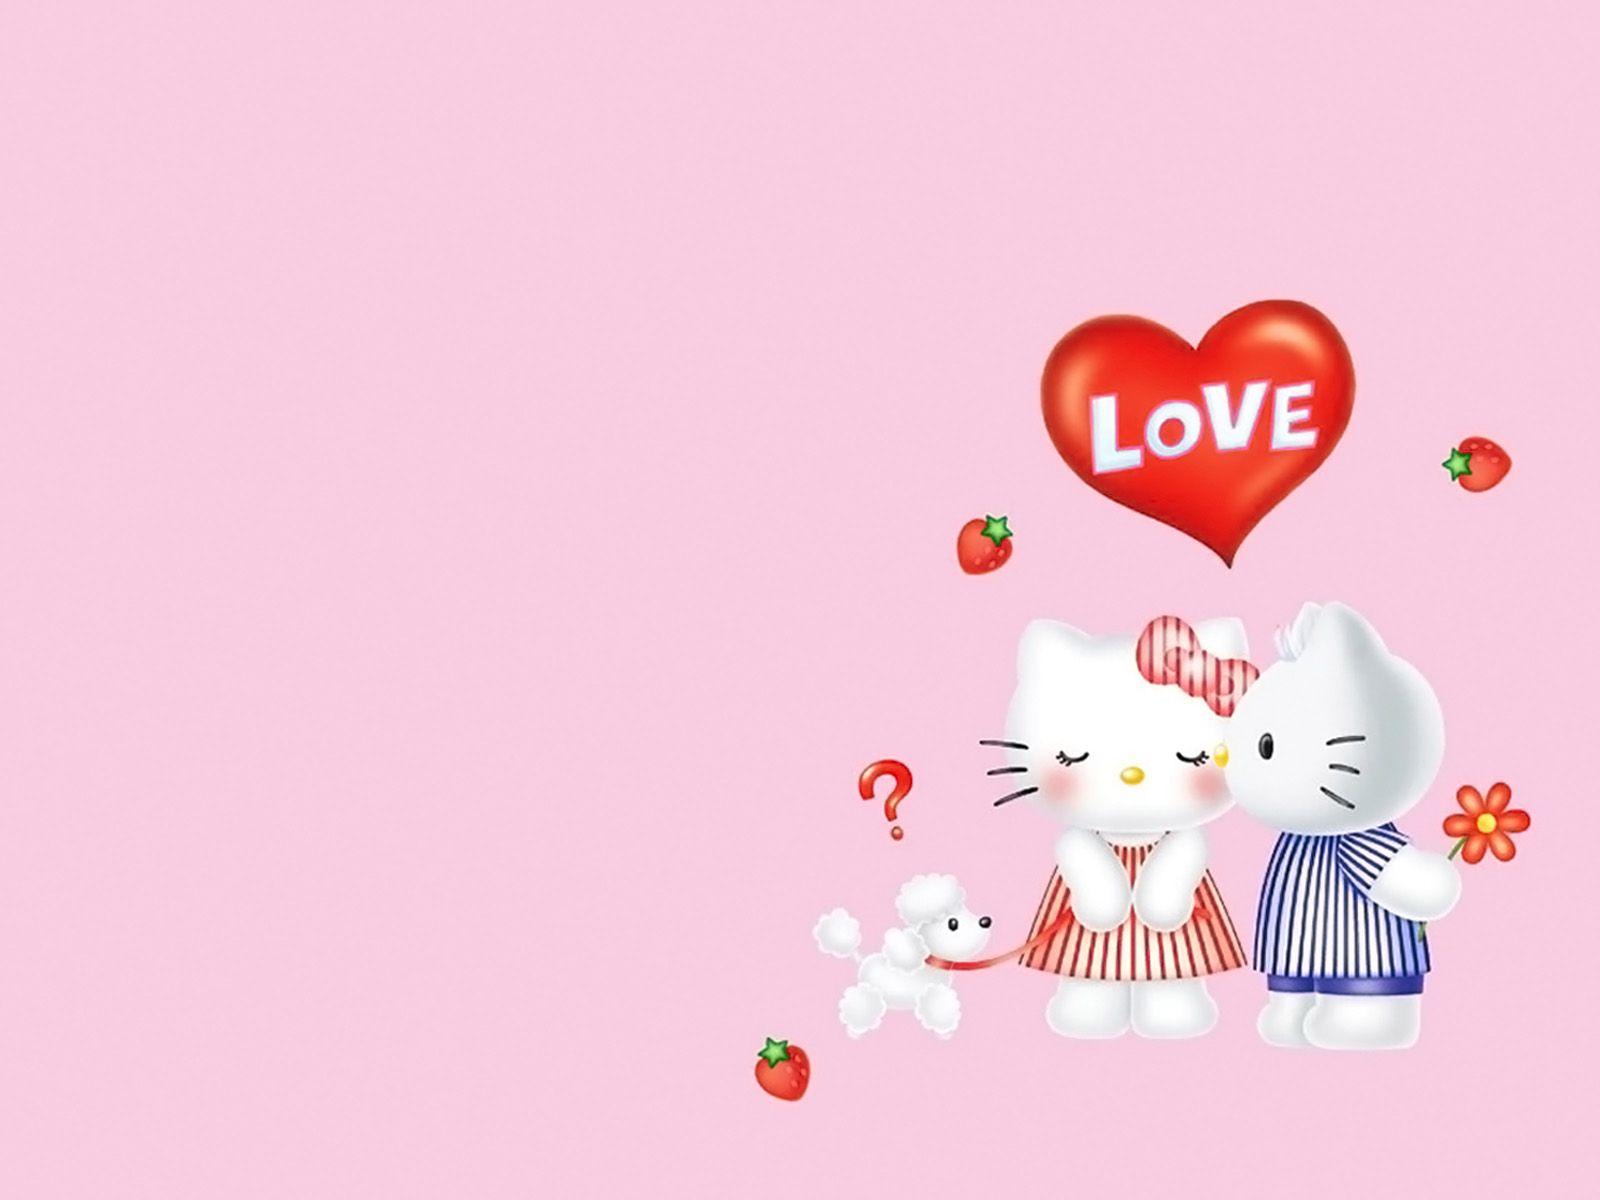 Popular Wallpaper Hello Kitty Vintage - 73f0aab1d5c90f233ac3e9363891d649  Image_80713.jpg